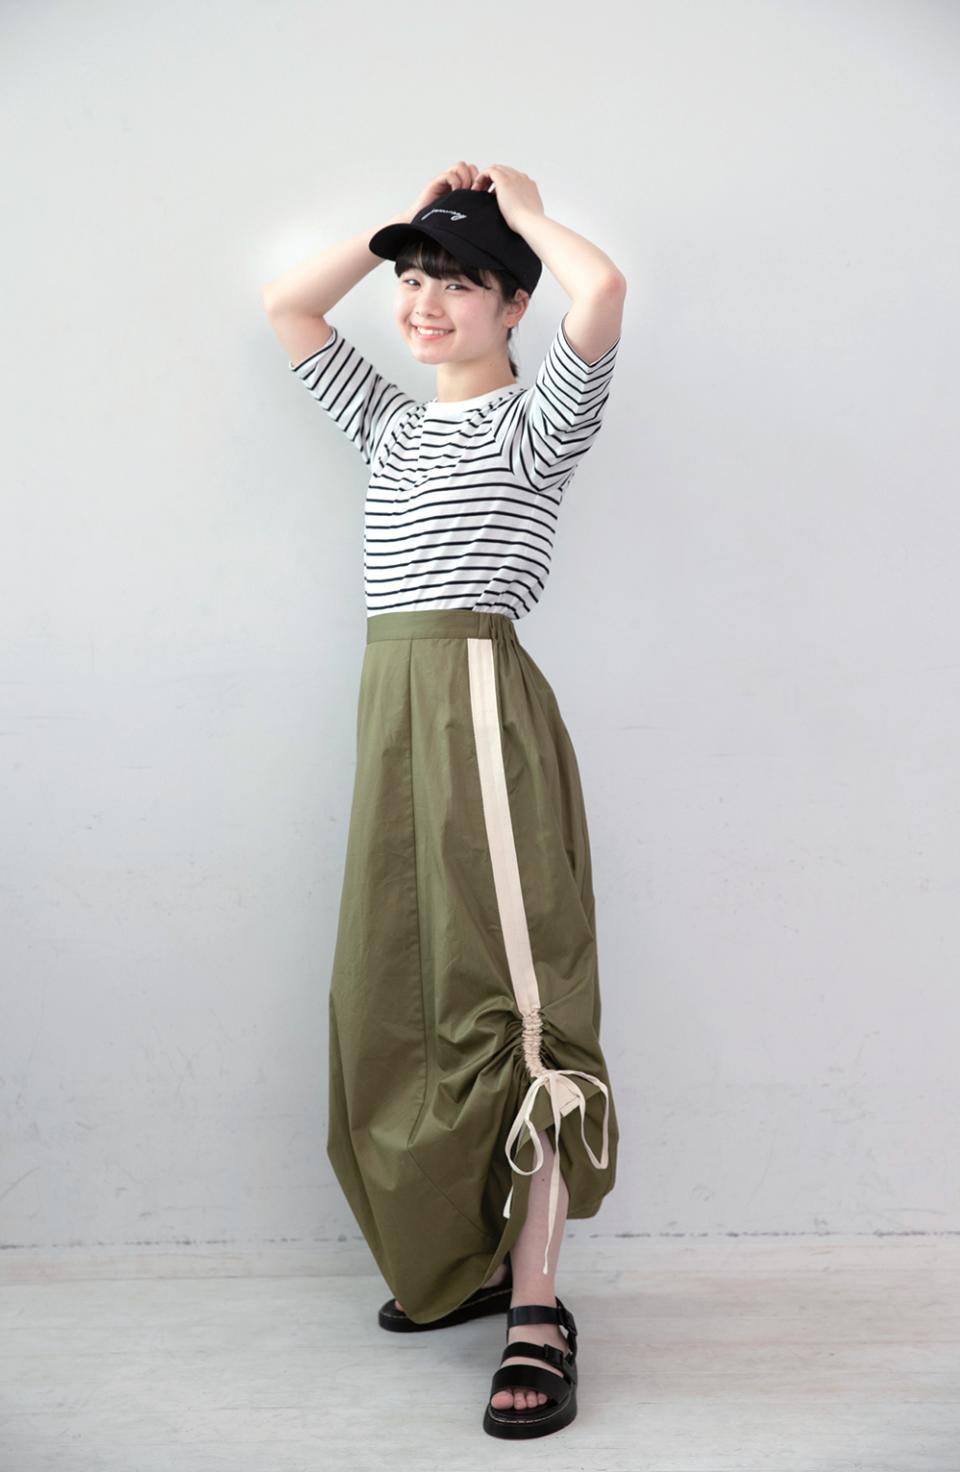 yuzu-collection-content-2998-1531276980.